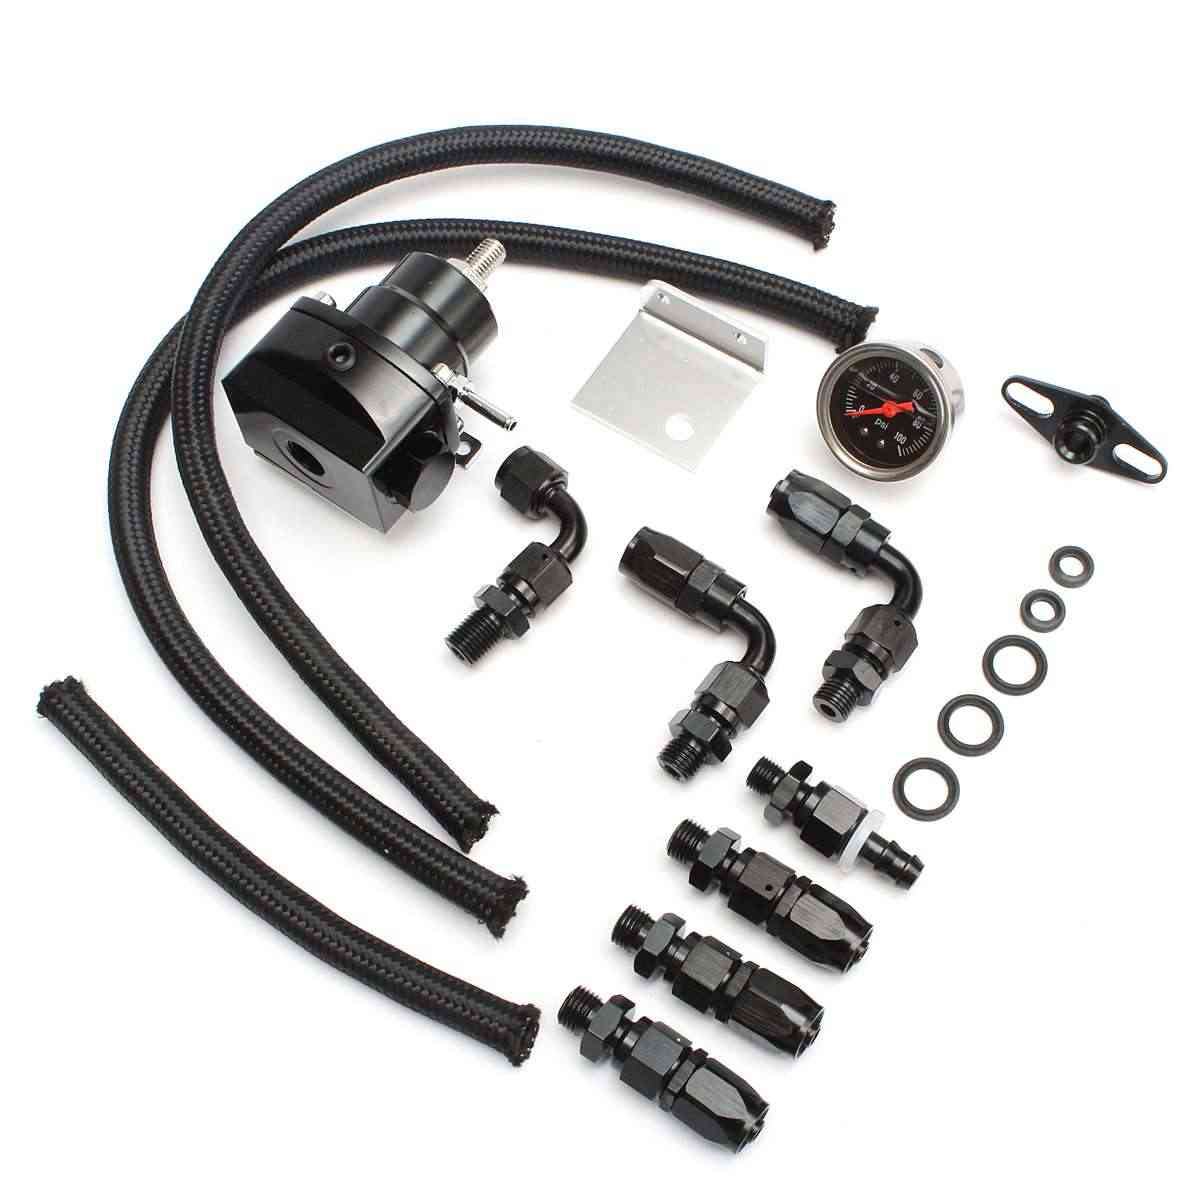 6g72 engine connecting rod for MITSUBISHI Montero Sport